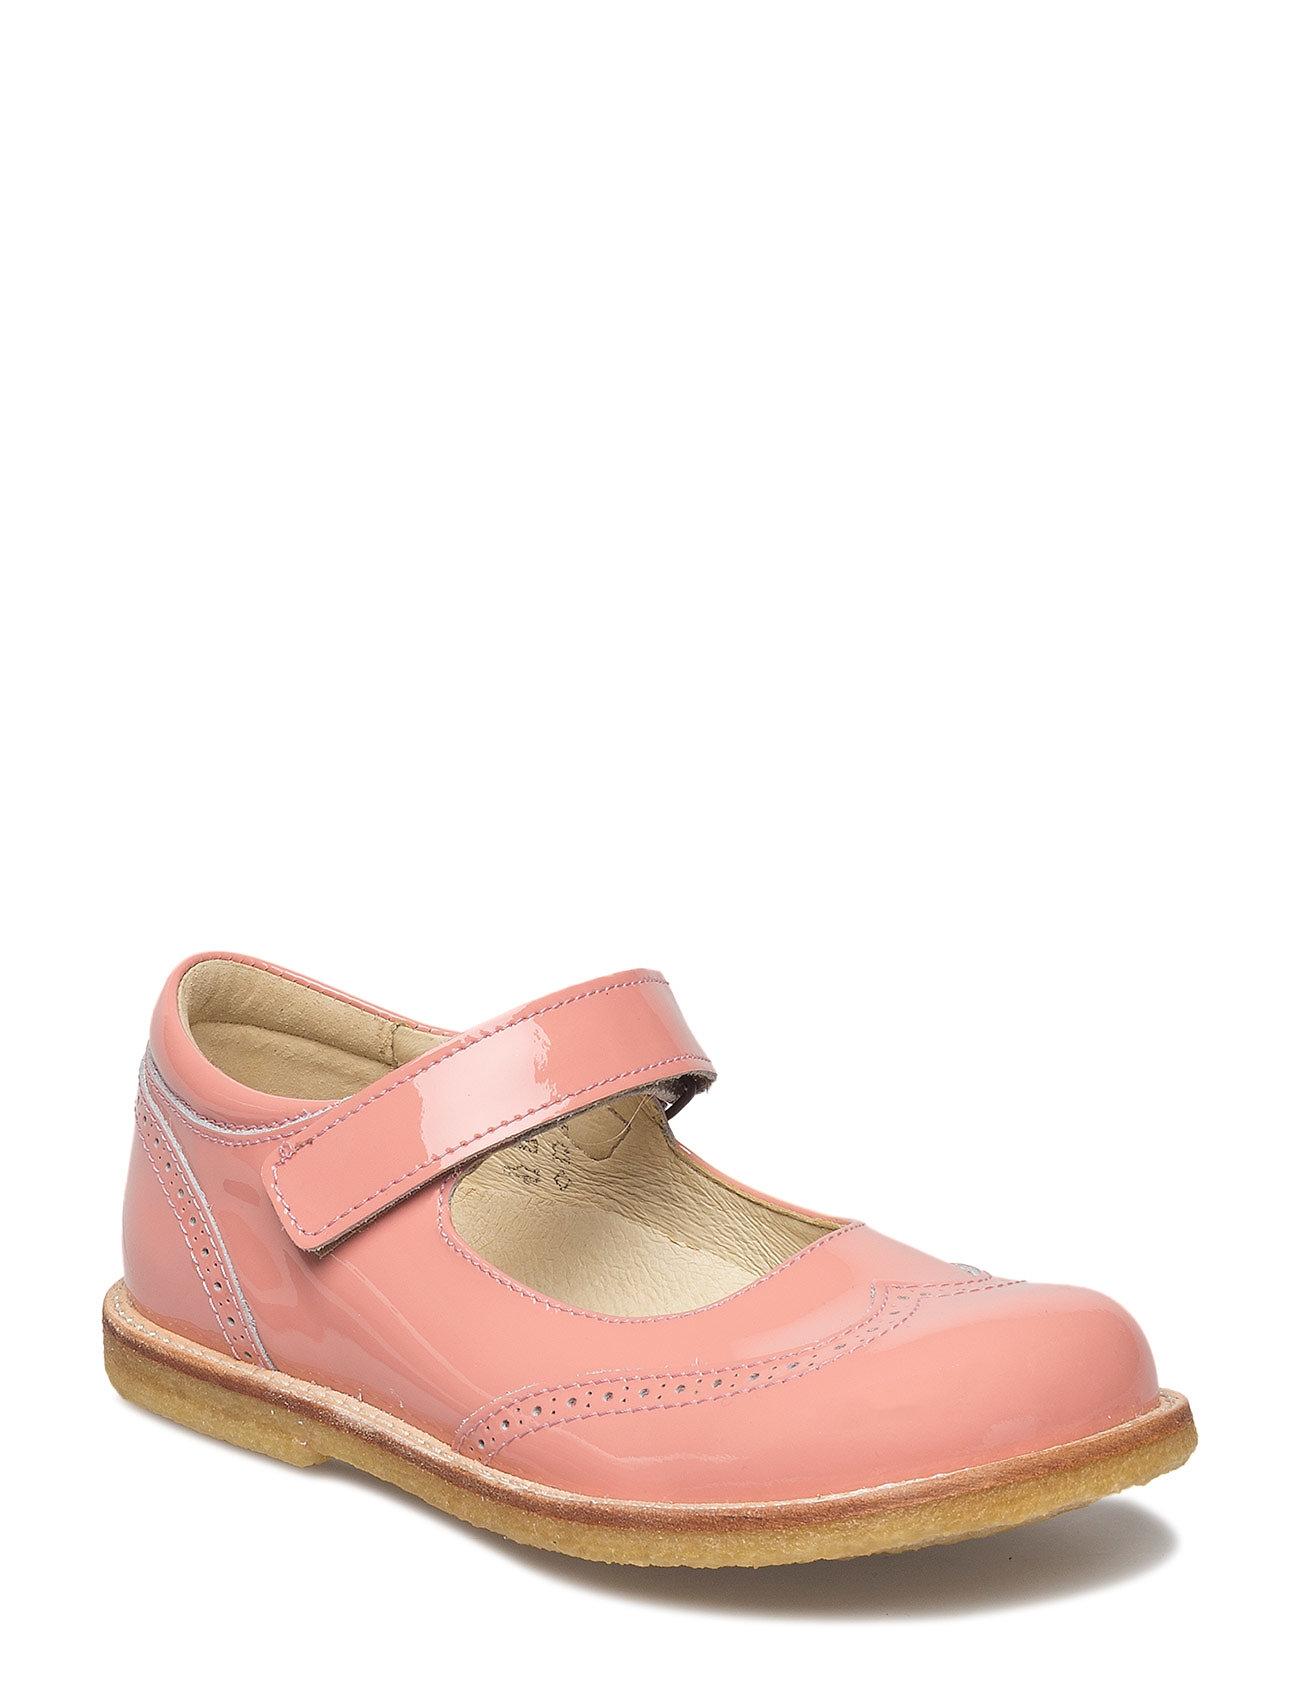 76021da2b0a8 Arauto RAP Ecological Hand Made Shoe (08-pat Pink)